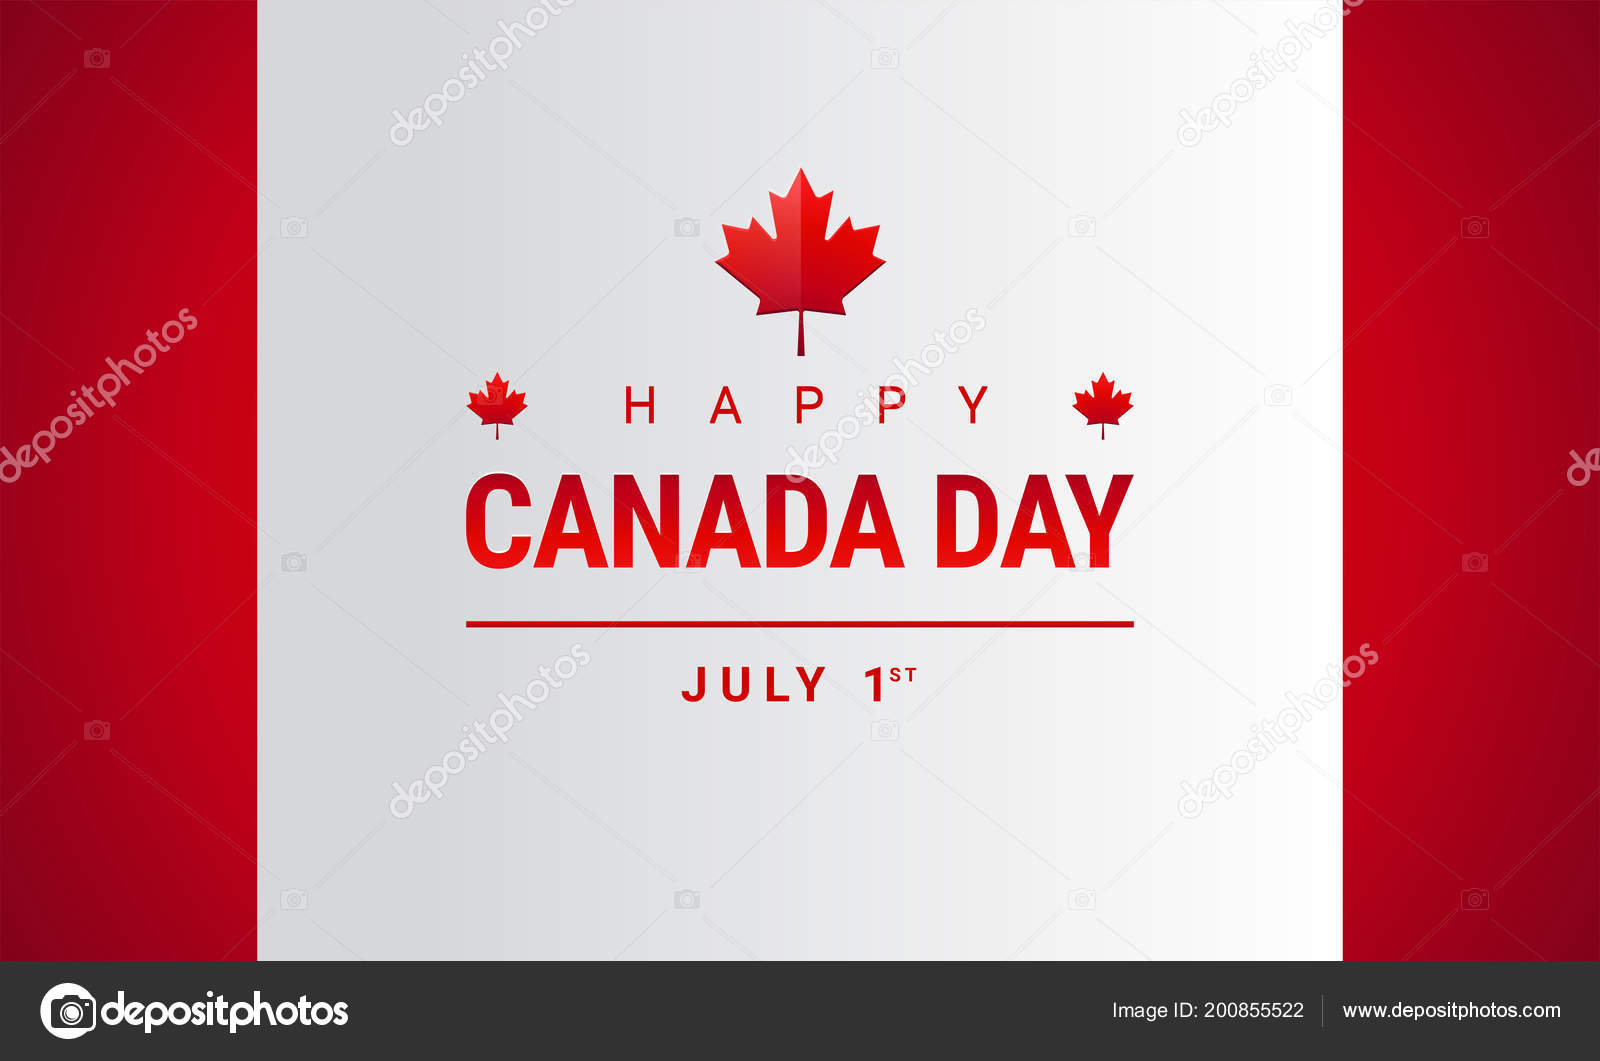 Happy canada day greeting card canada maple leaf flag 151 stock happy canada day greeting card canada maple leaf flag 151 stock vector m4hsunfo